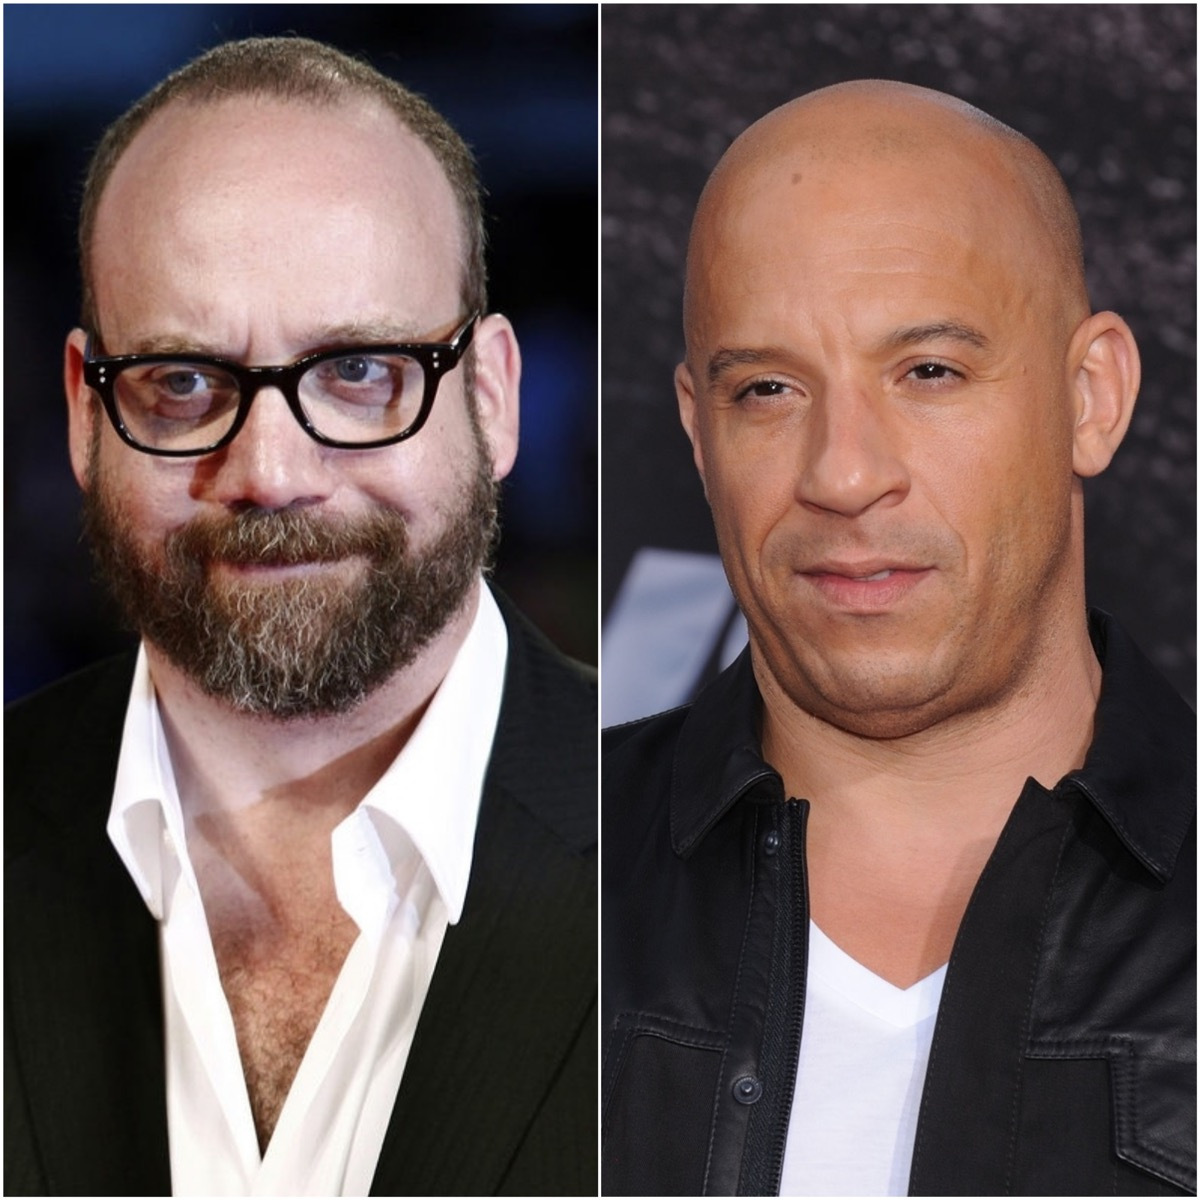 Paul Giamatti and Vin Diesel